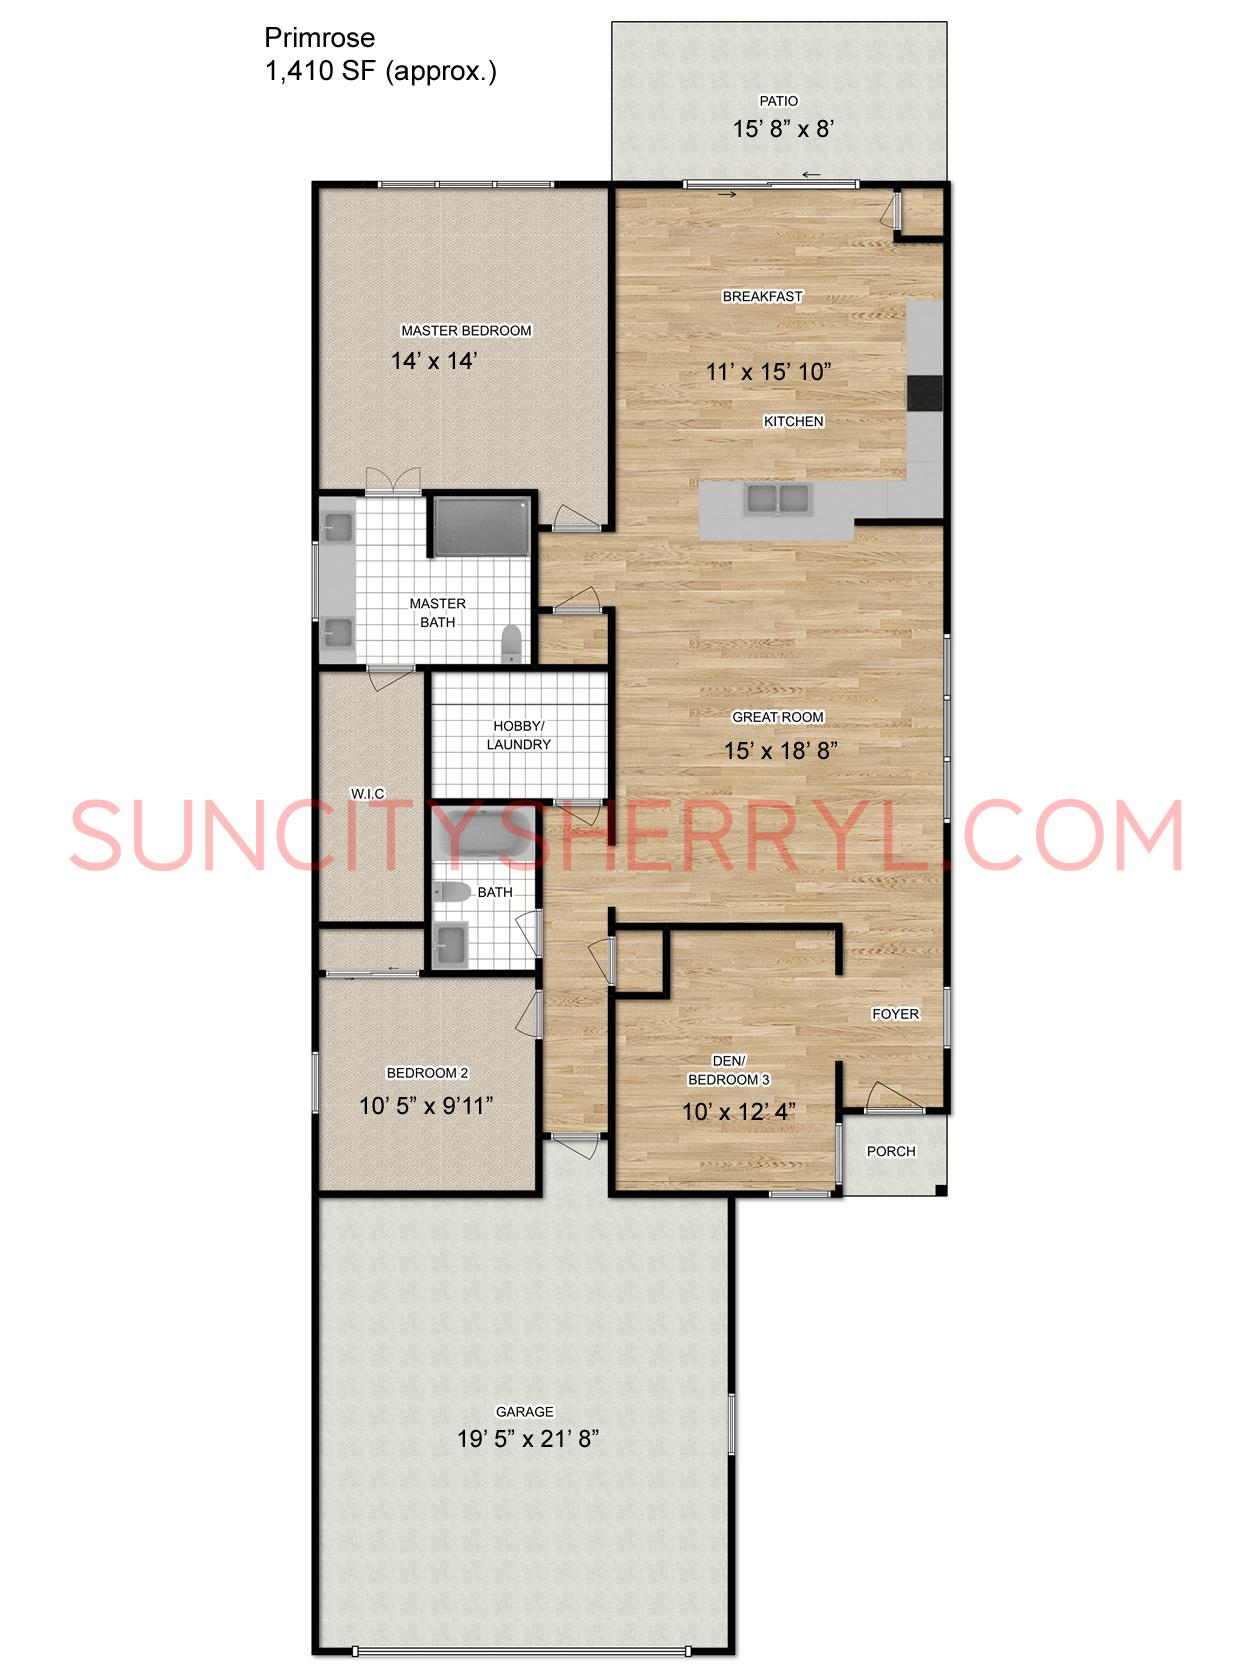 Free Virtual Room Layout Planner: Sun City Hilton Head Floor Plan Primrose